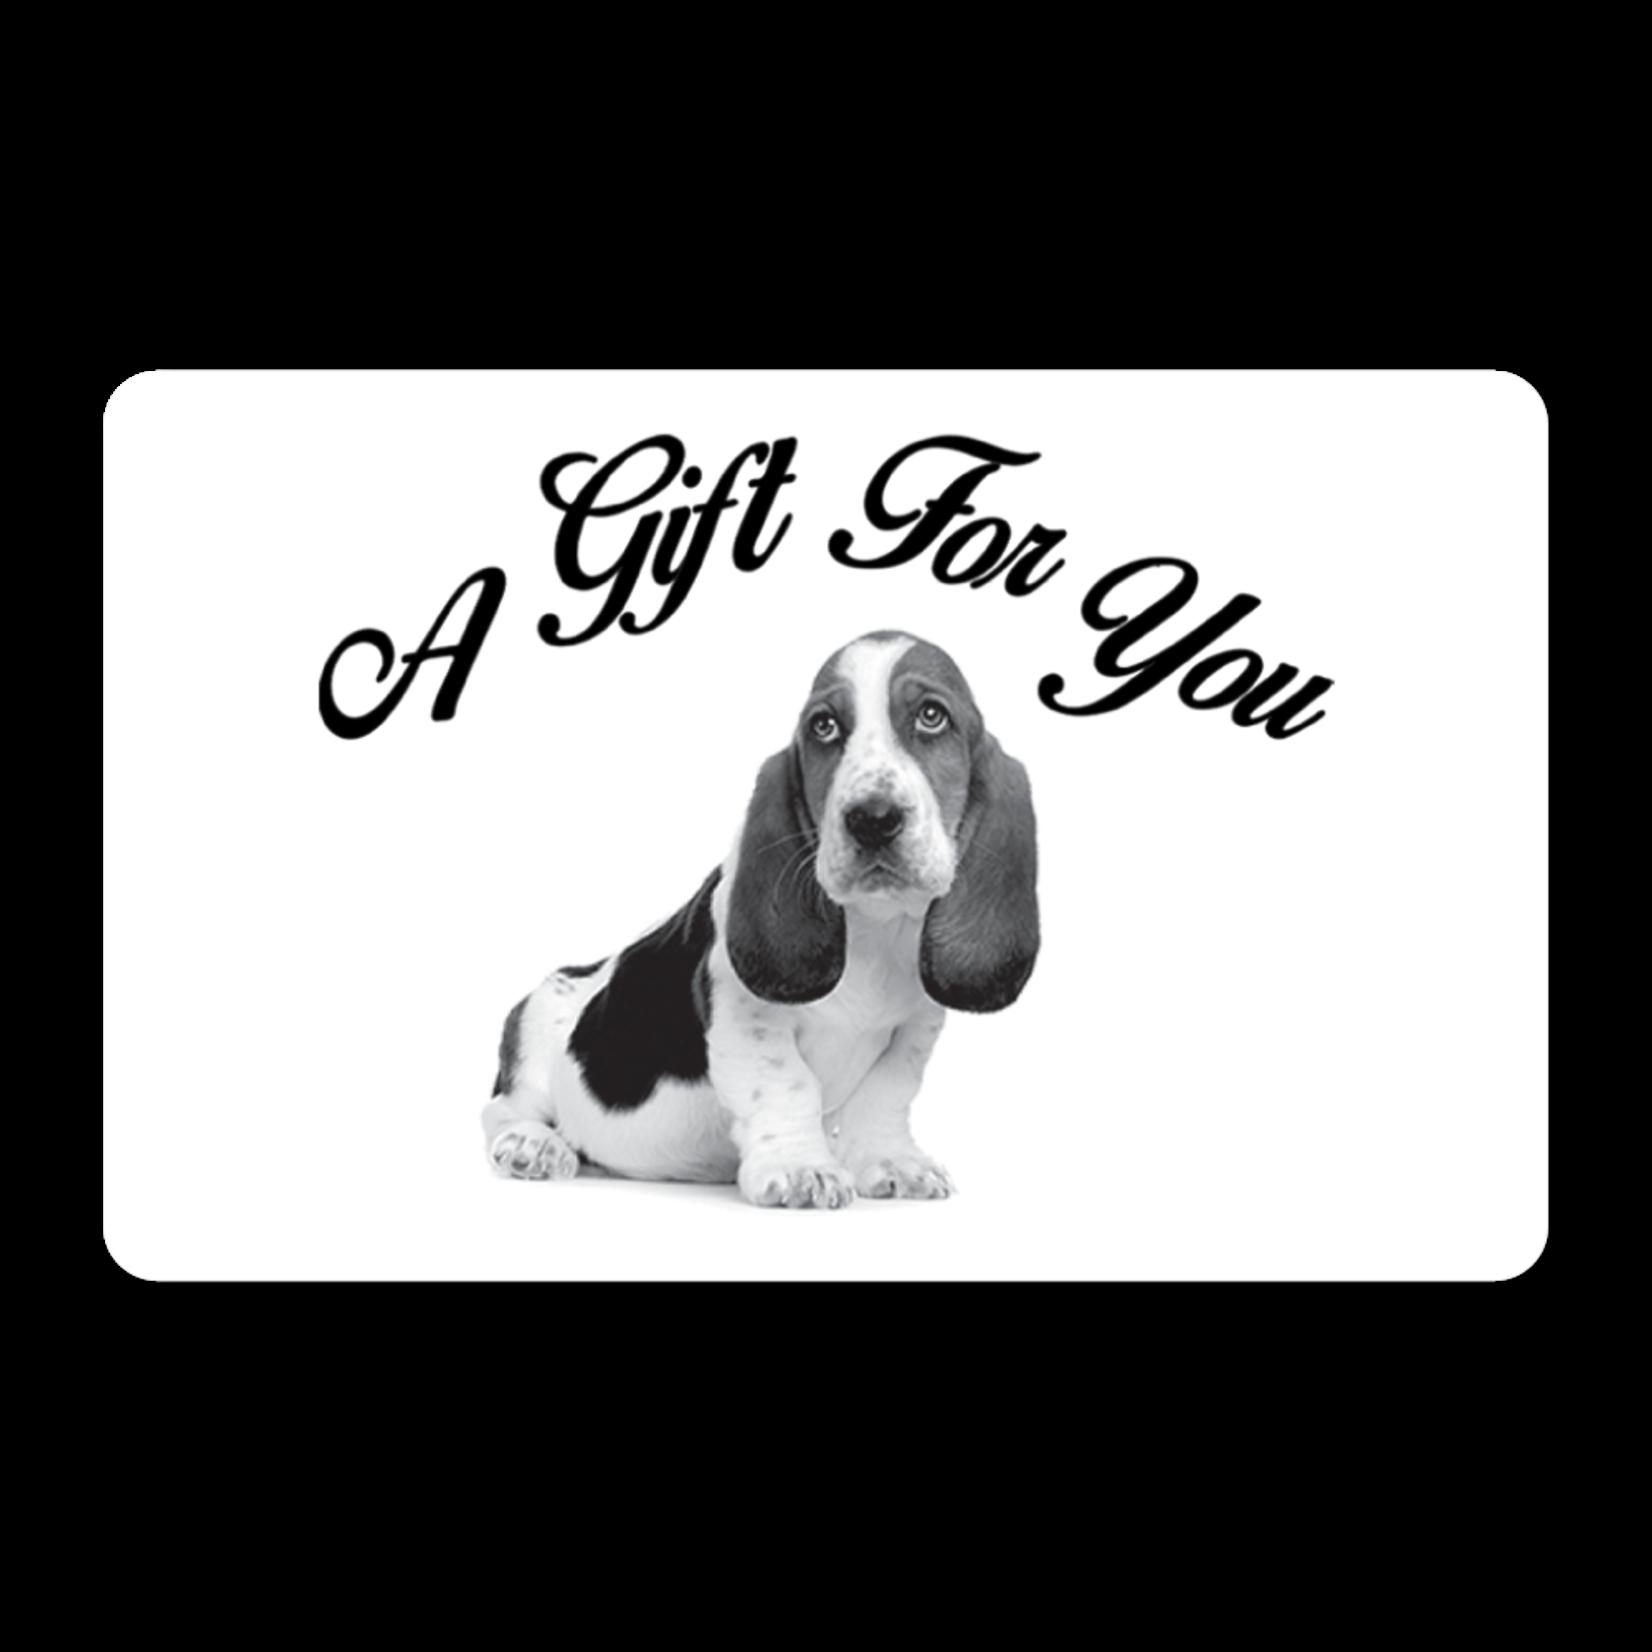 Gift Cards - Dog